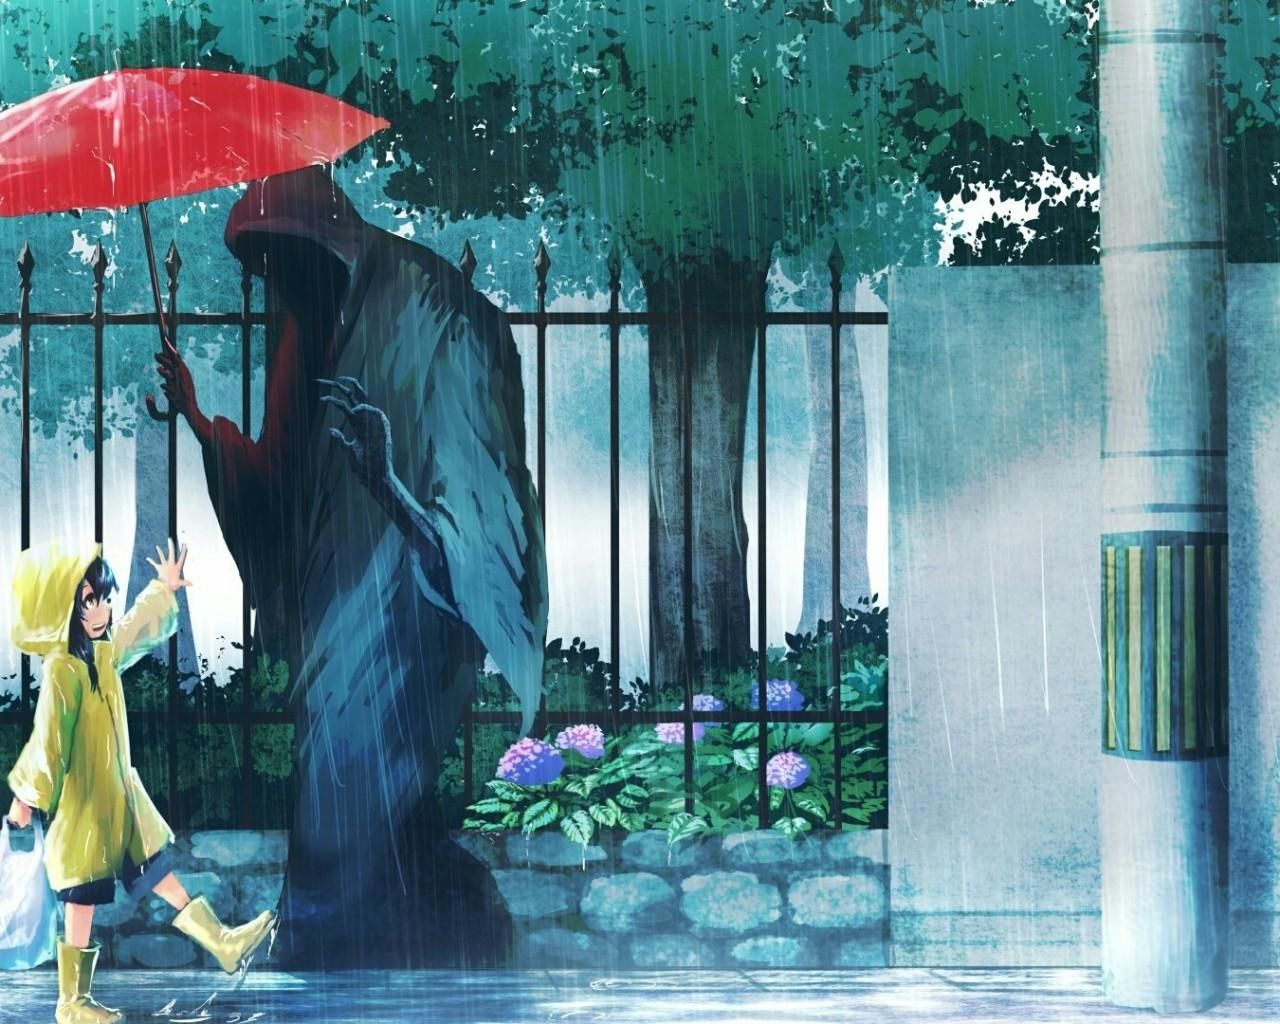 19+ Anime Rainy Wallpaper Download - Baka Wallpaper